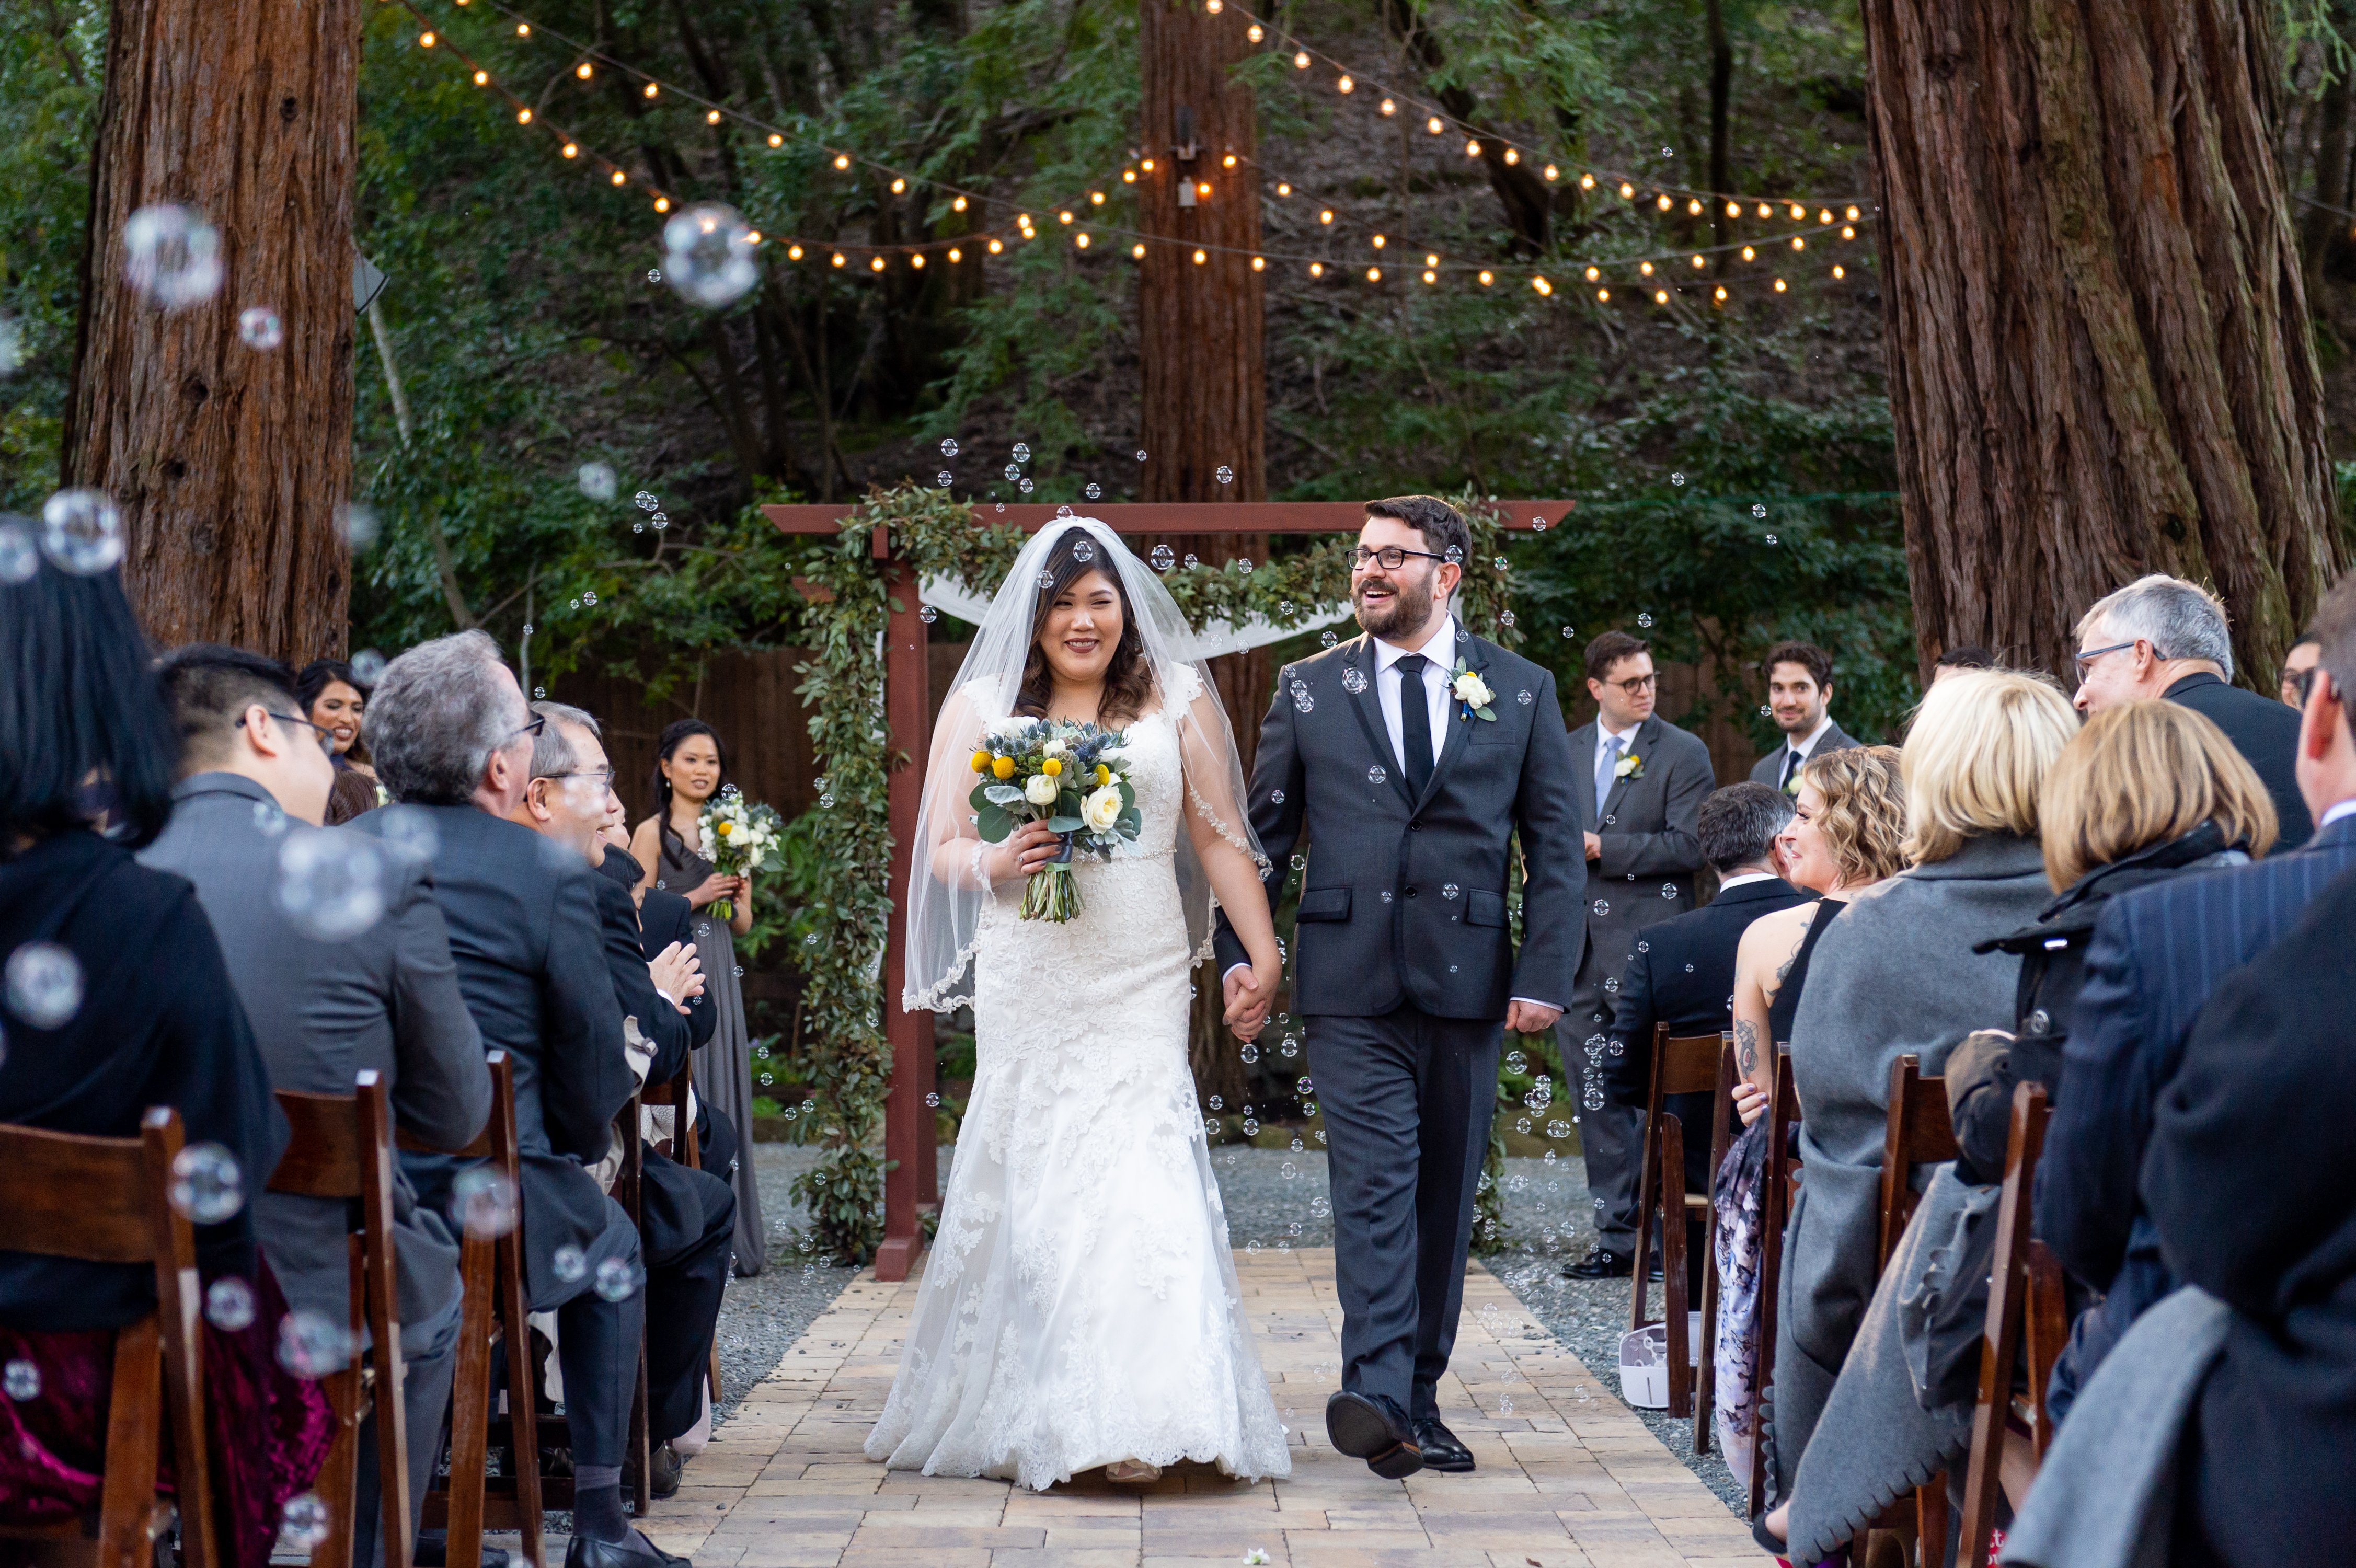 Couple walks down aisle at Deer Park Villa wedding fairfax by chloe jackman photography